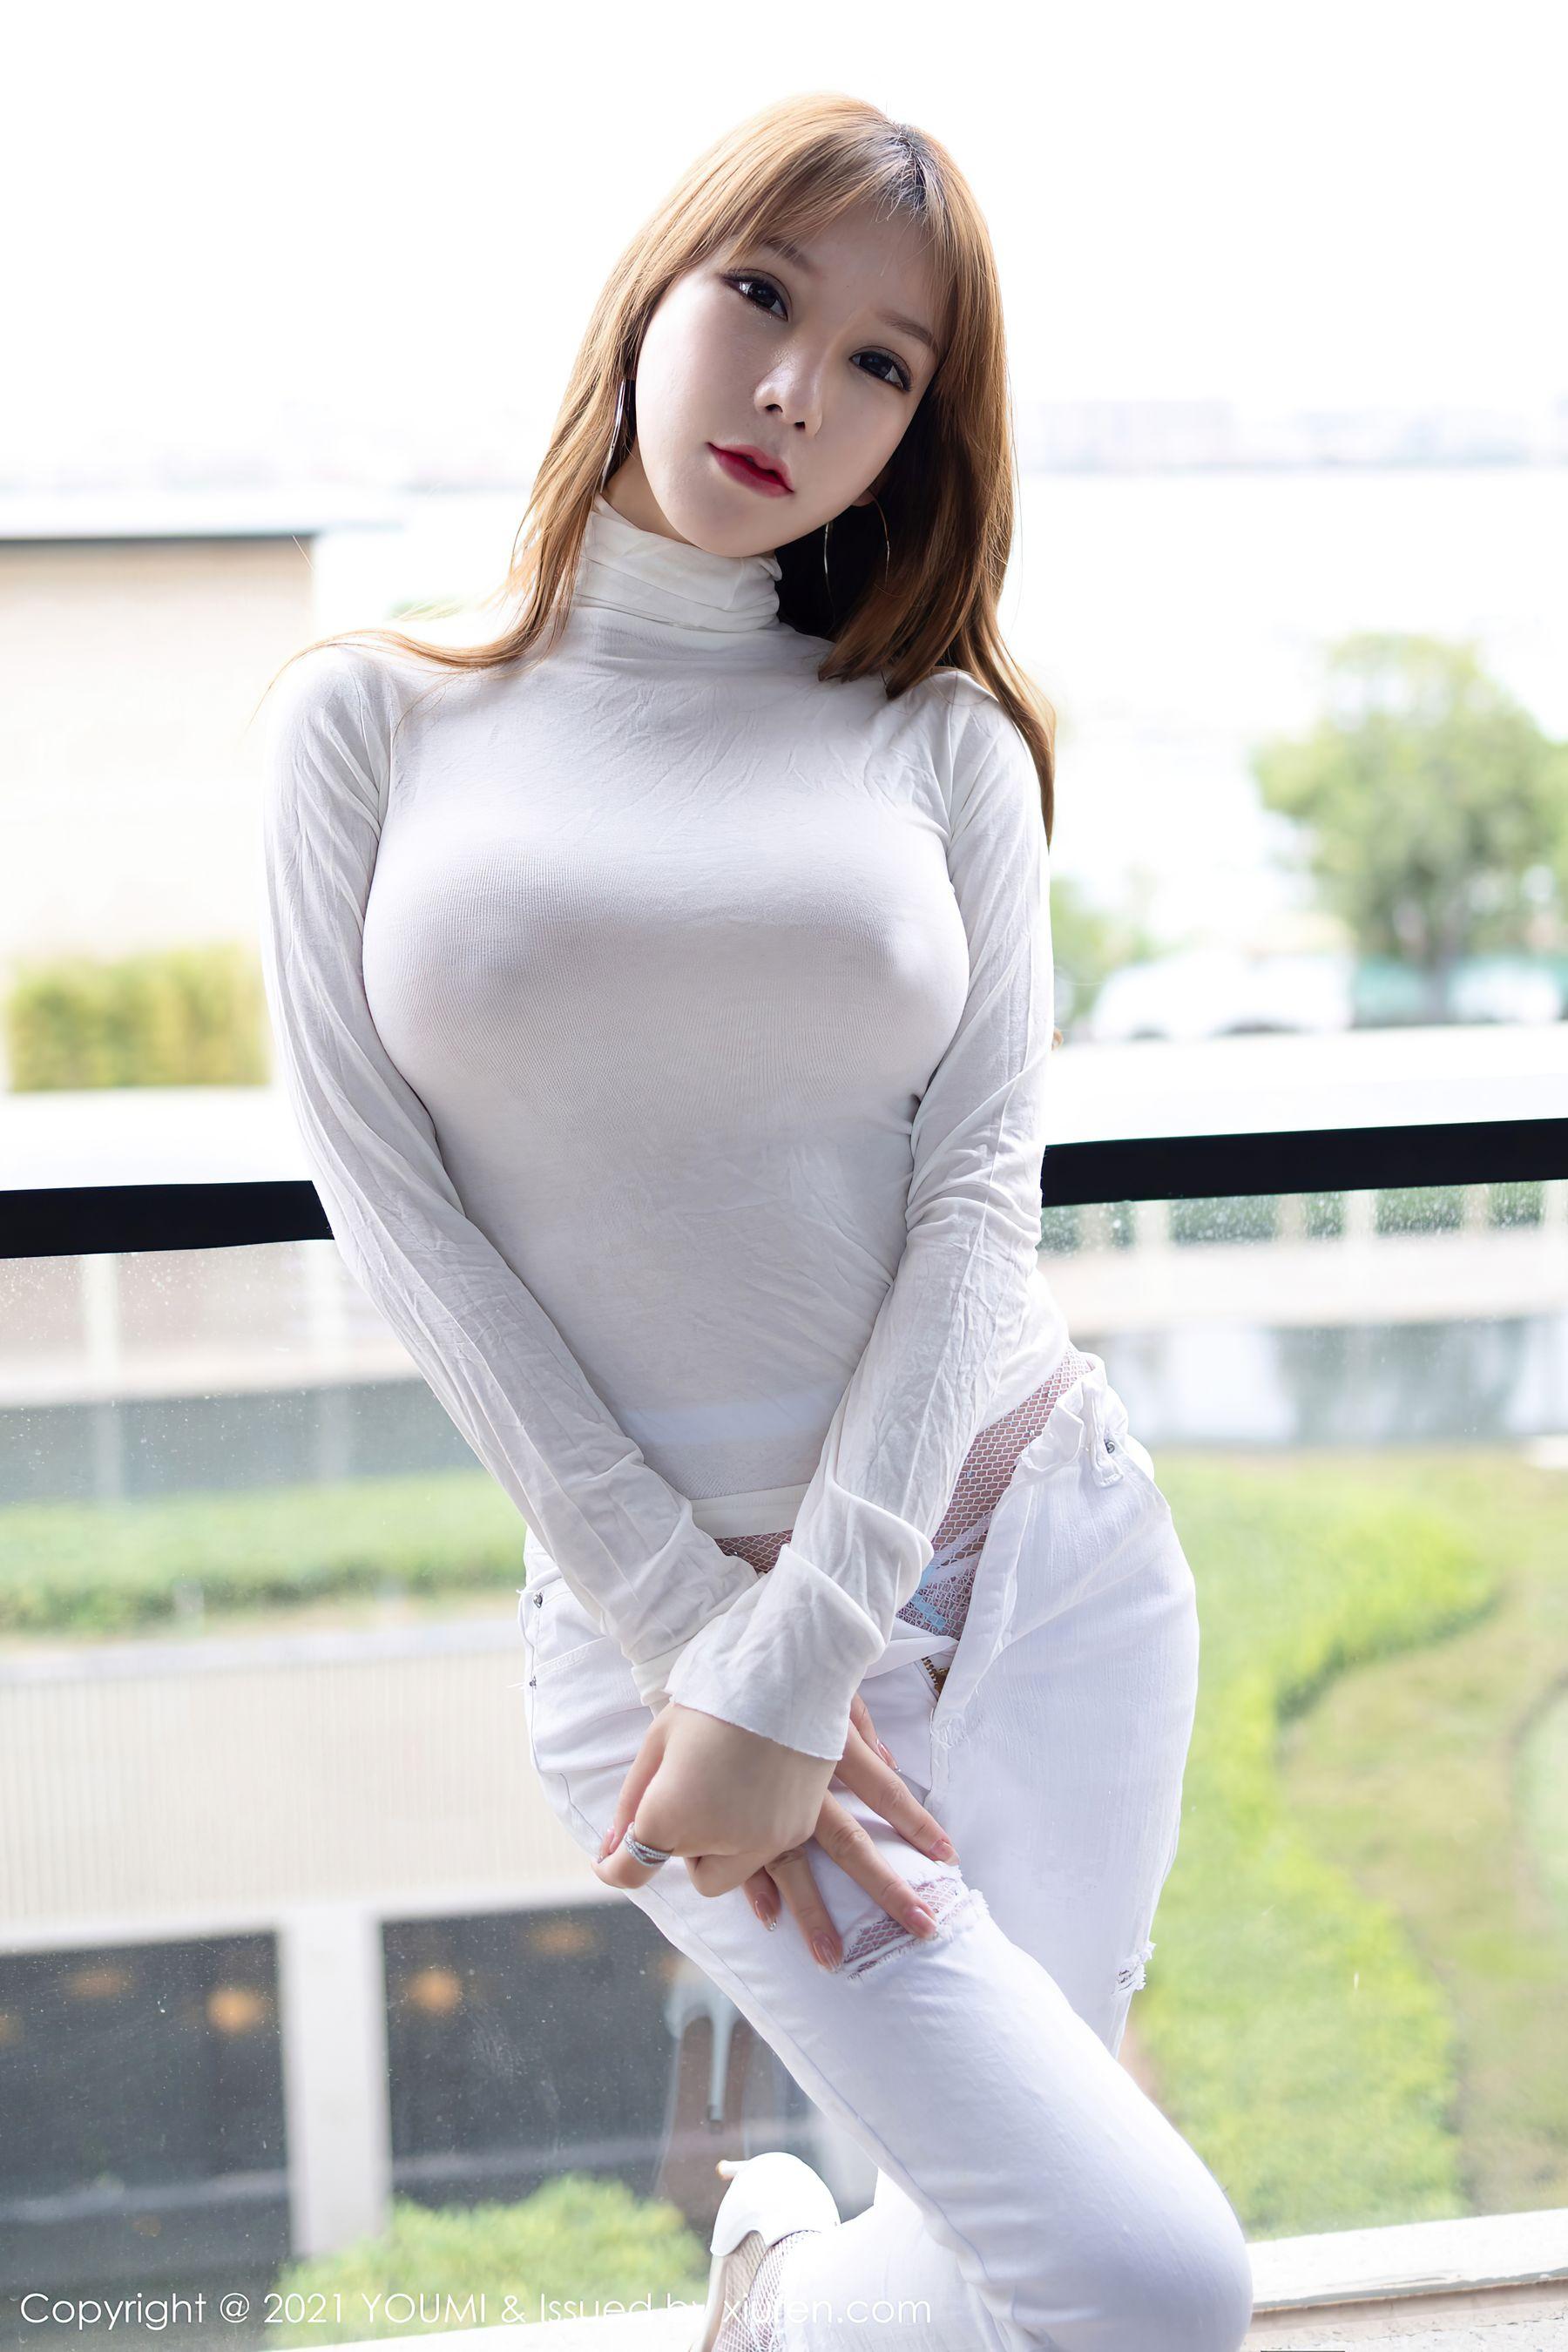 VOL.214 [尤蜜荟]大胸紧身裤:周于希(周于希Sandy)超高清写真套图(56P)